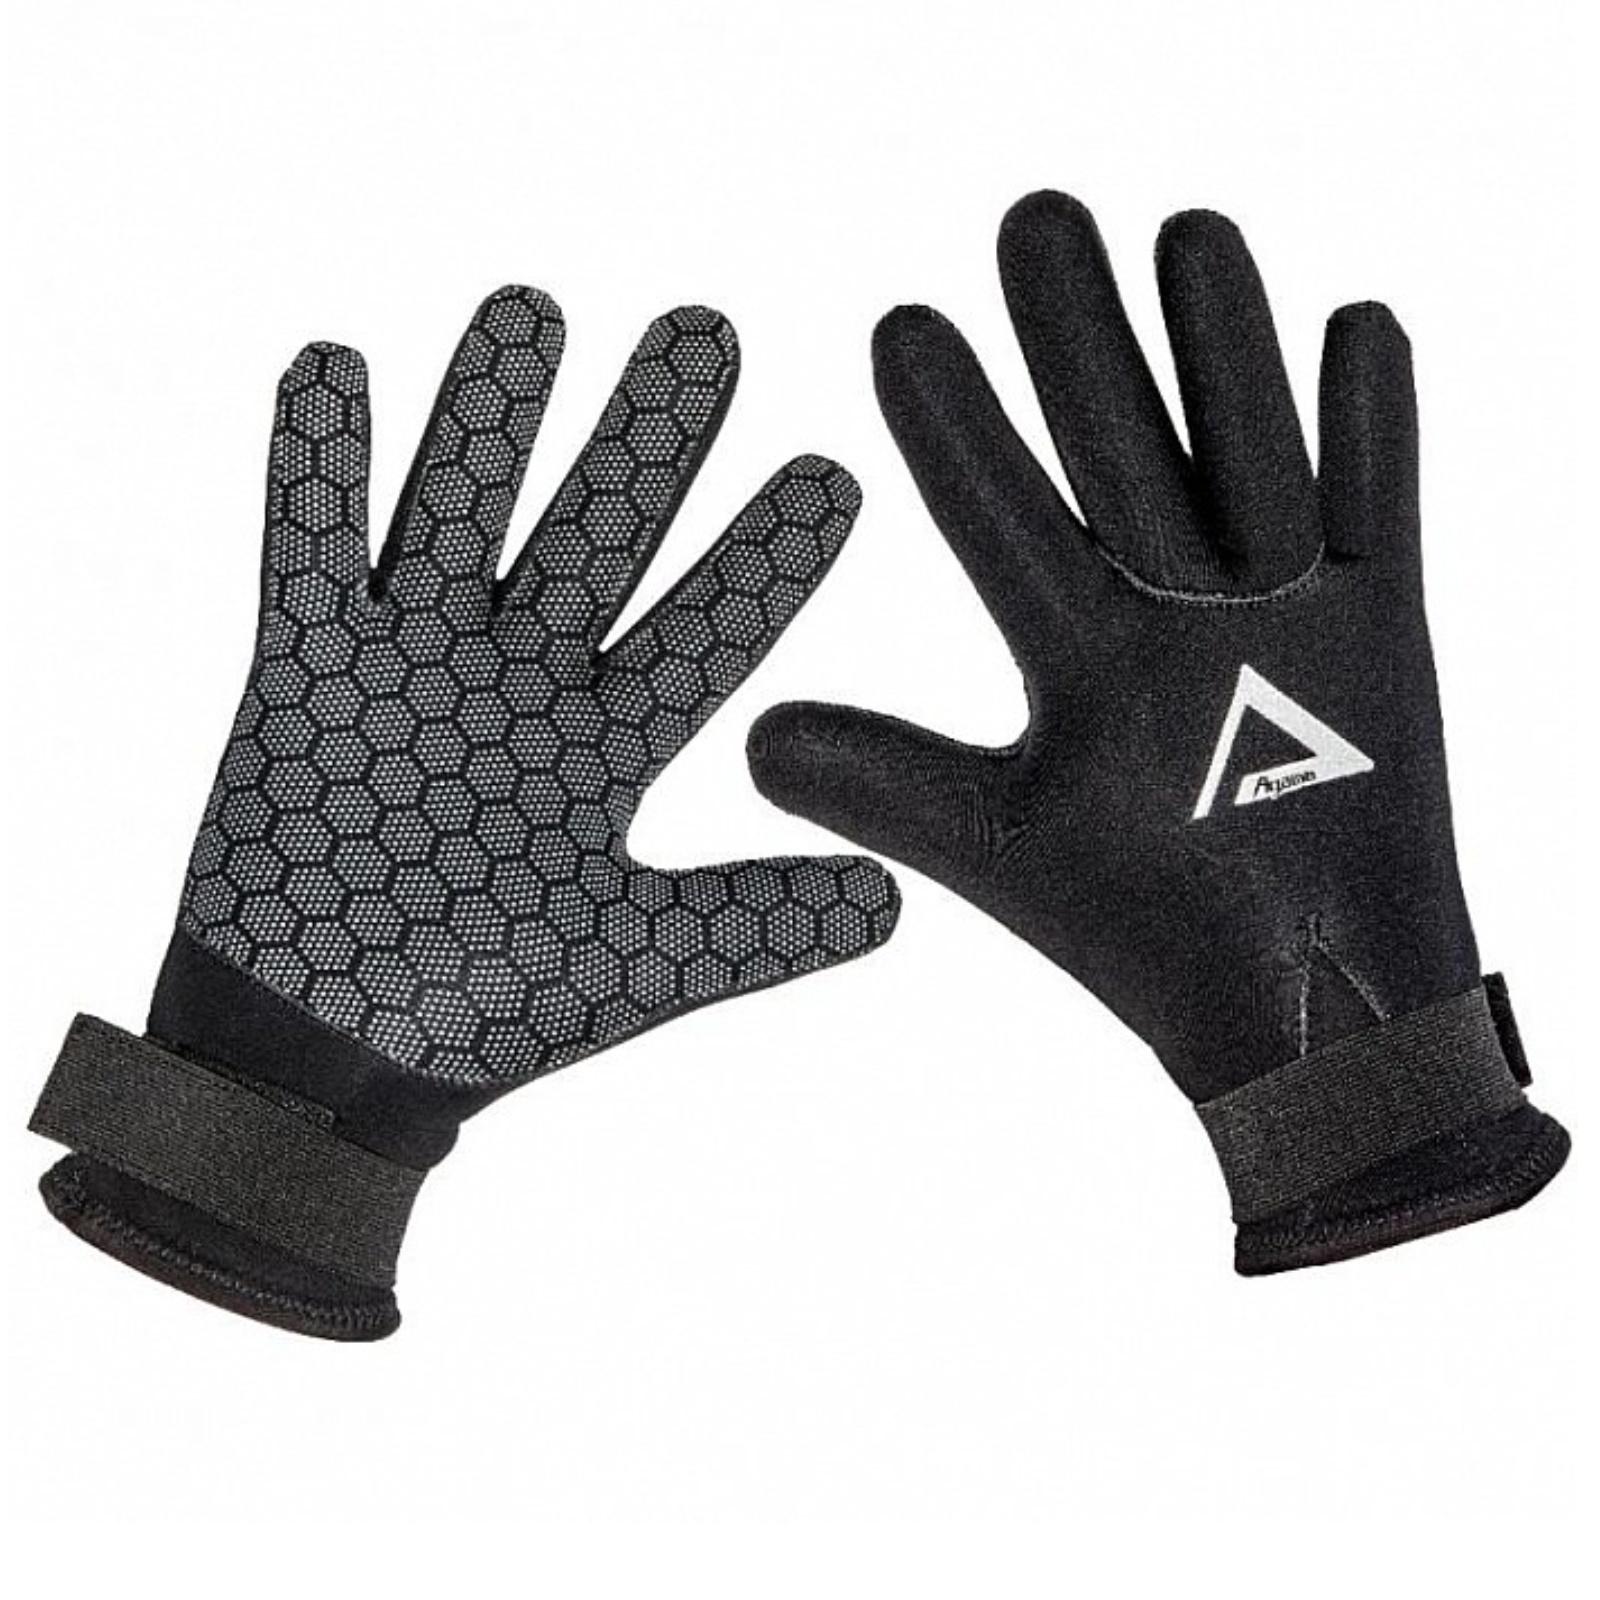 Neoprenové rukavice AGAMA Superstretch 5 mm - vel. XL